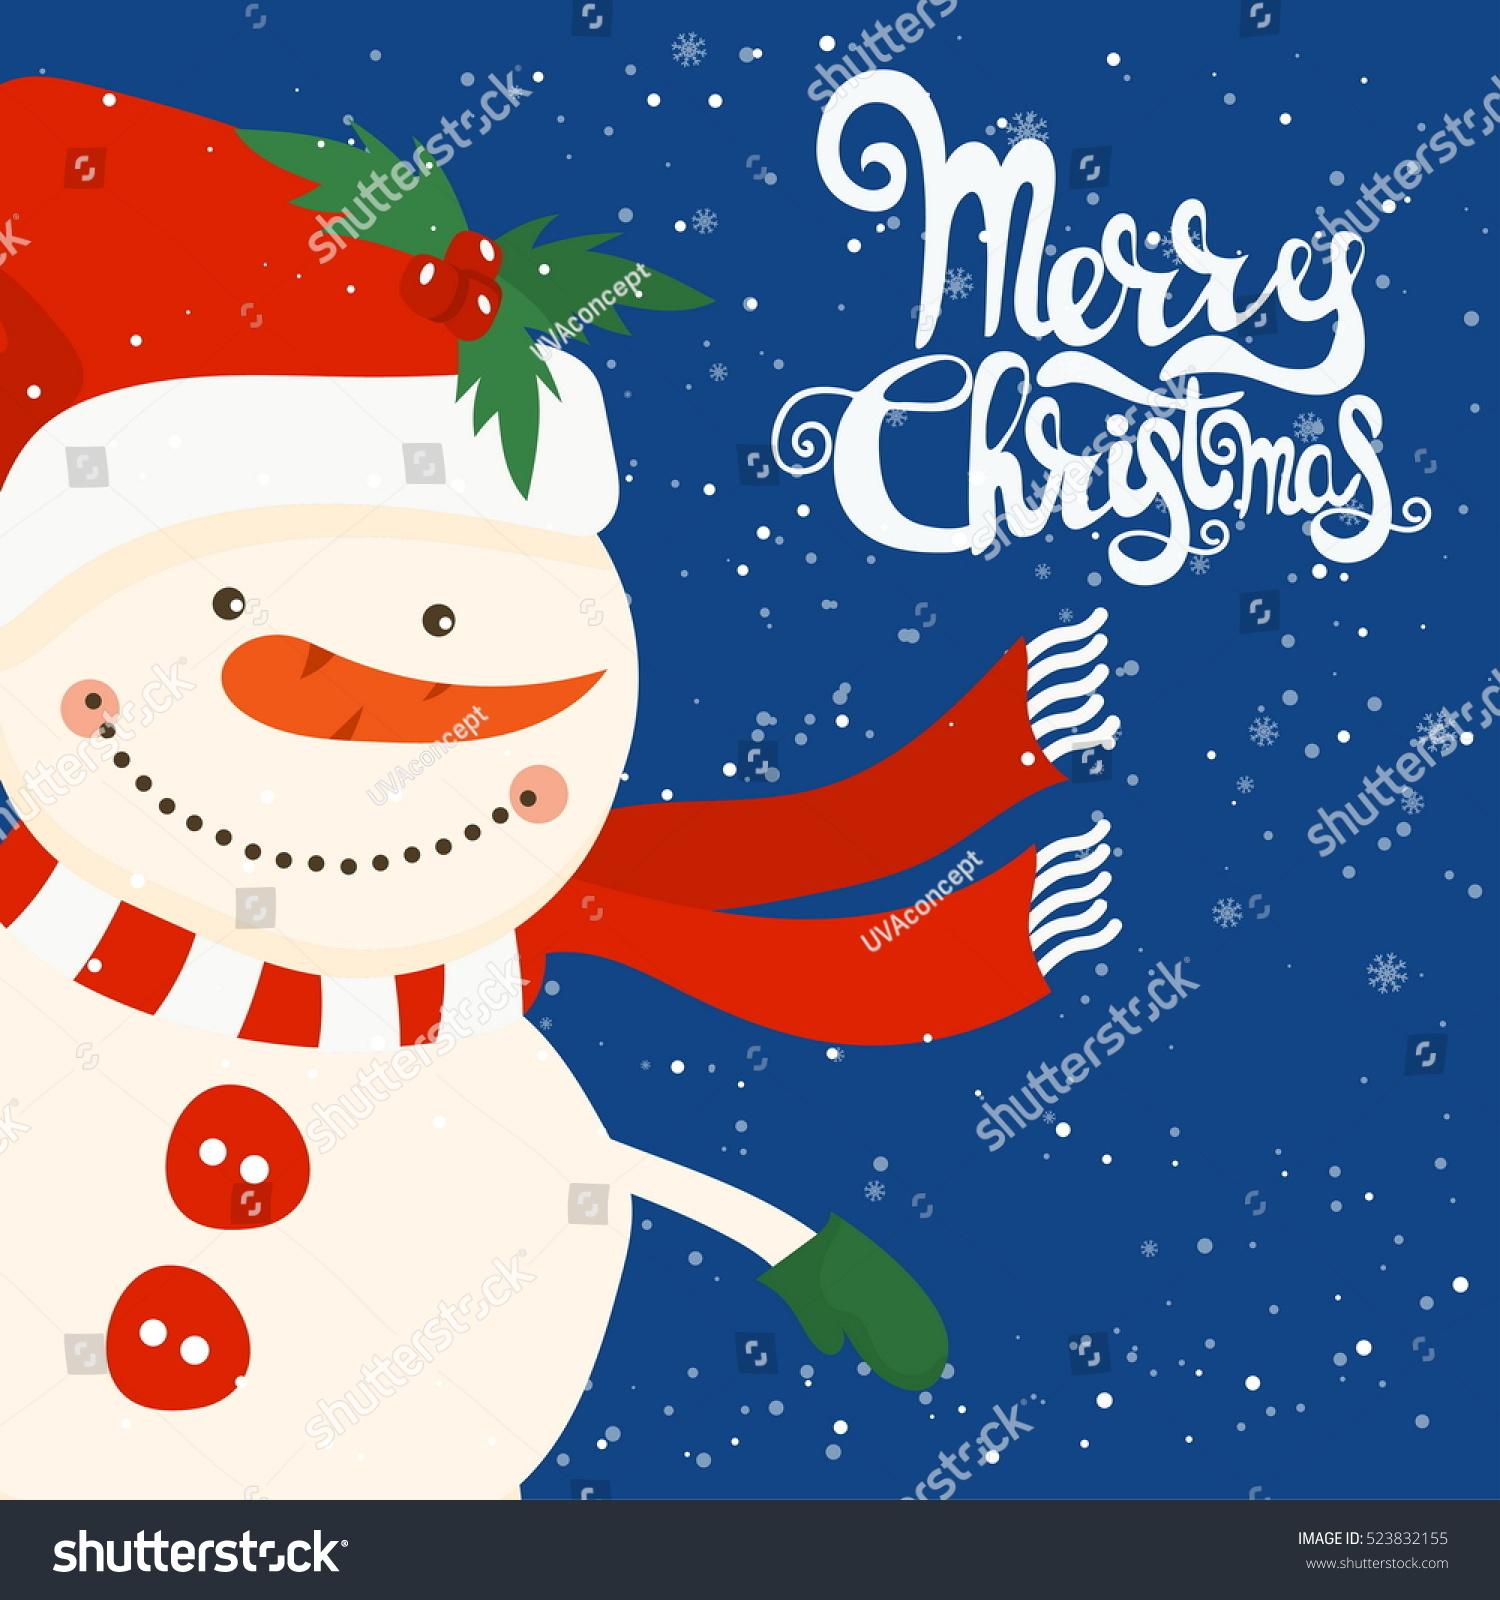 Cartoon Illustration Holiday Theme Snowman Stock Vector